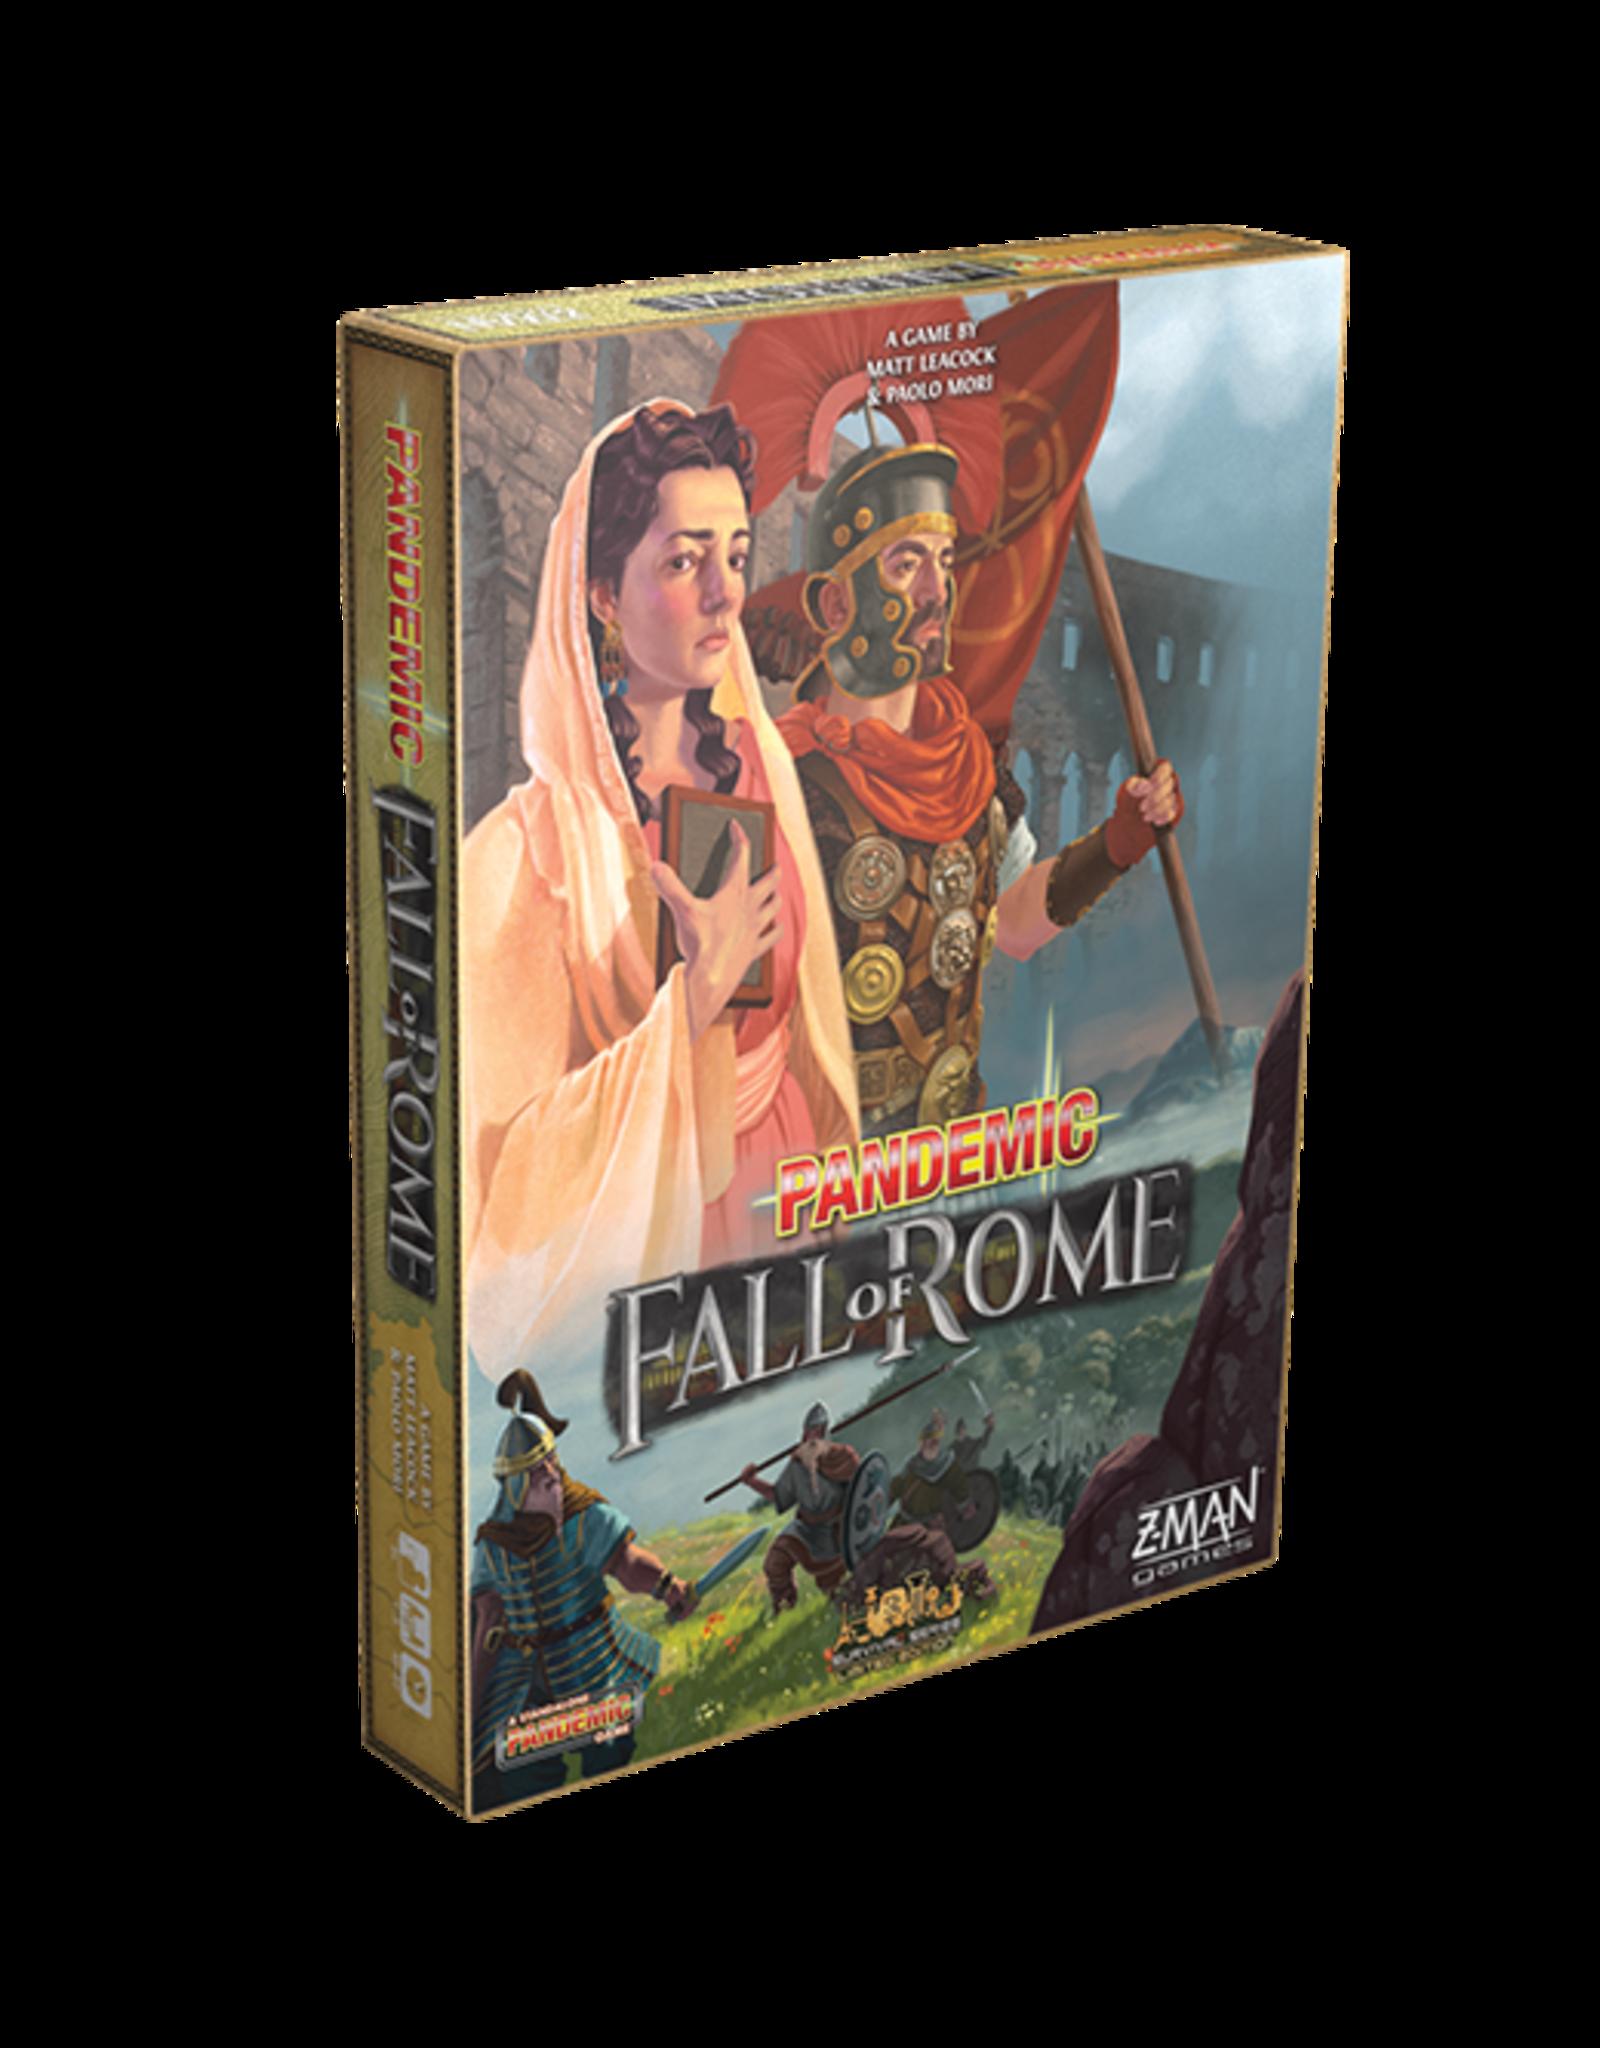 Z-MAN Games Pandemic Fall of Rome